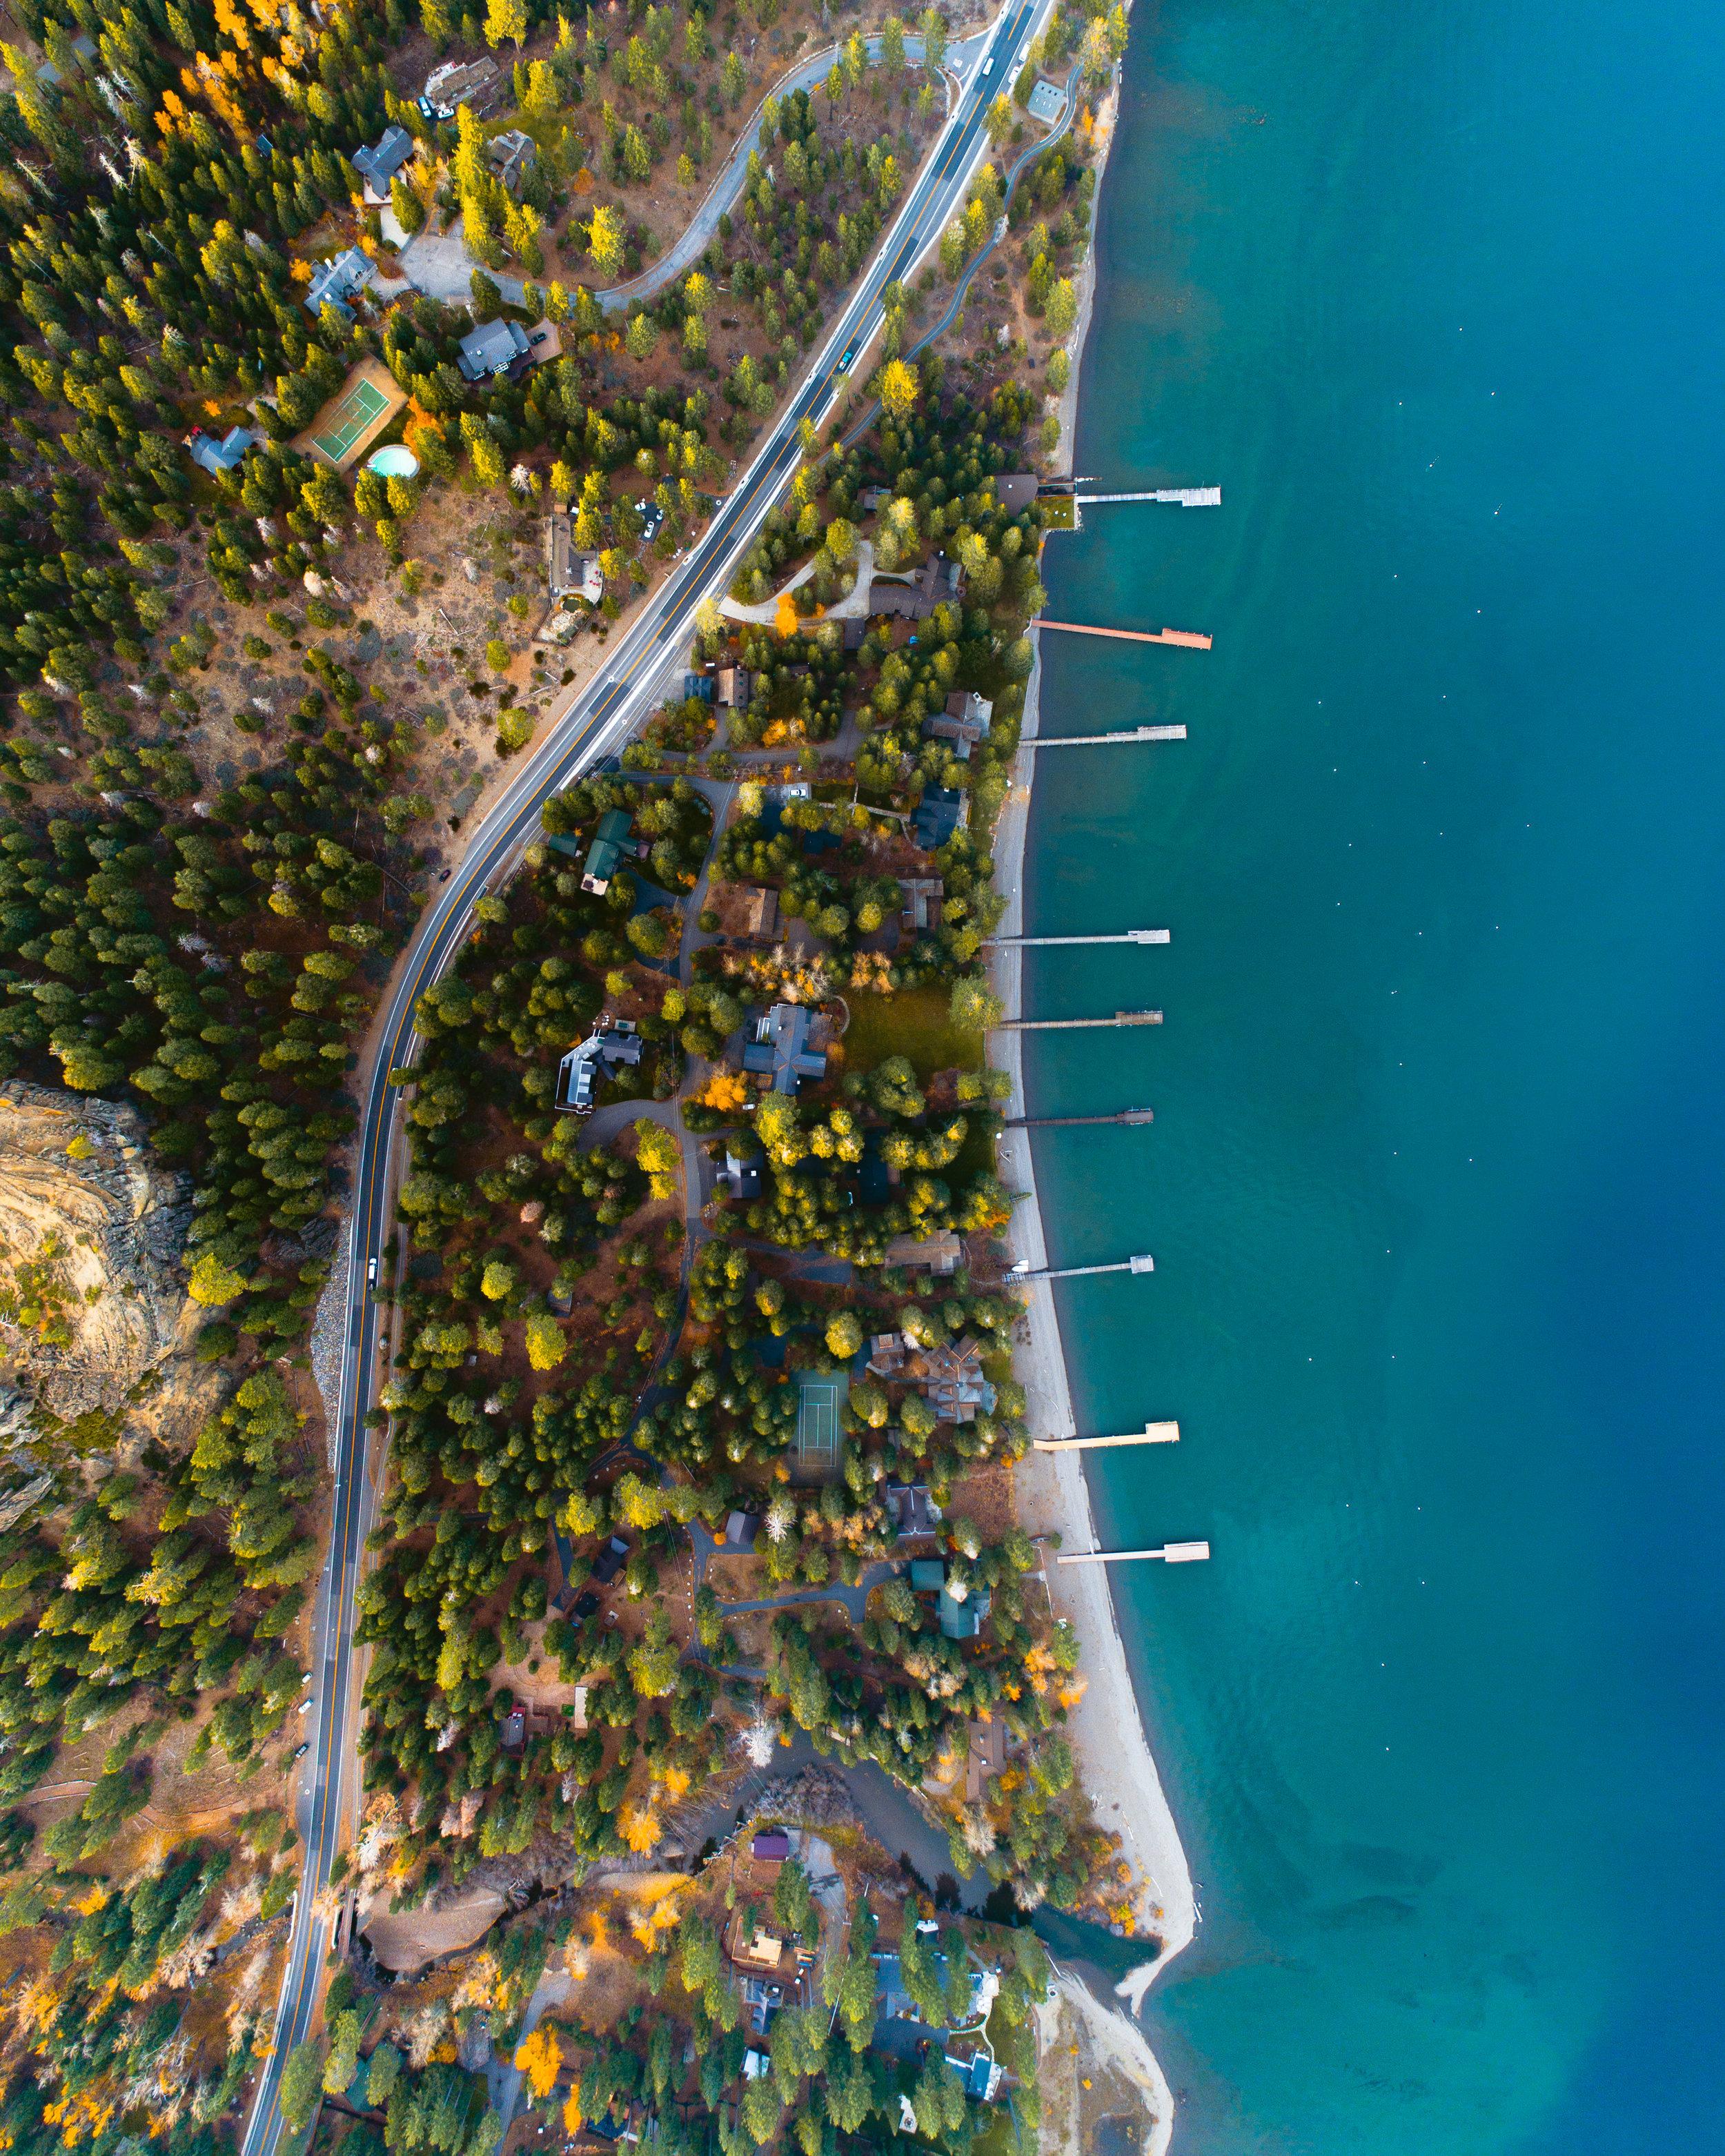 Drone Docks One.jpg